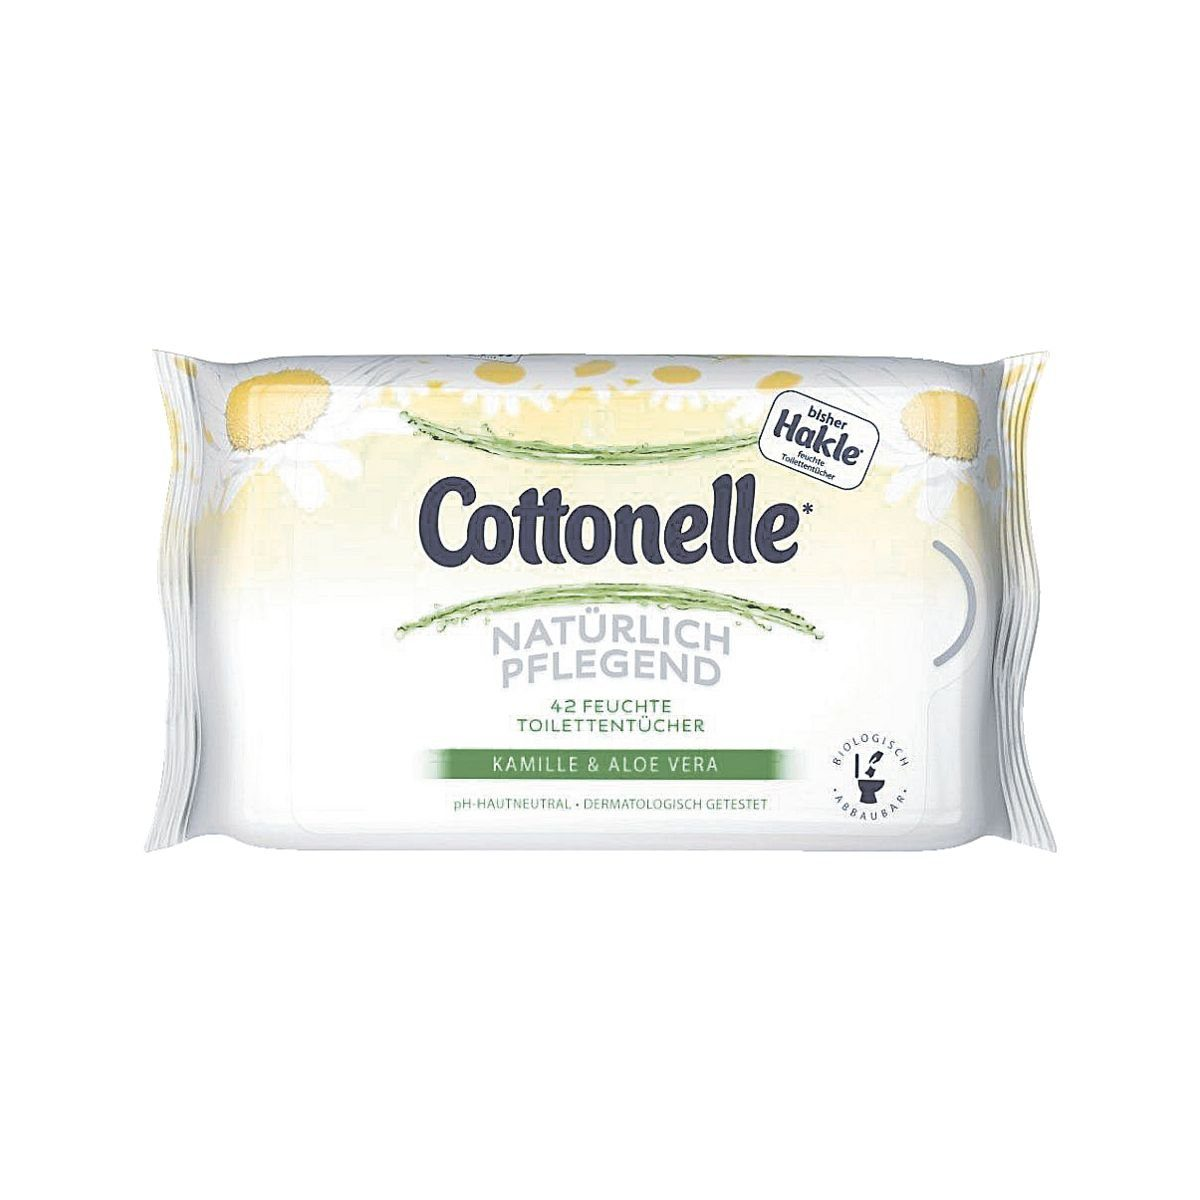 HAKLE Feuchte Toilettentücher »Cottonelle Kamille & Aloe Vera«